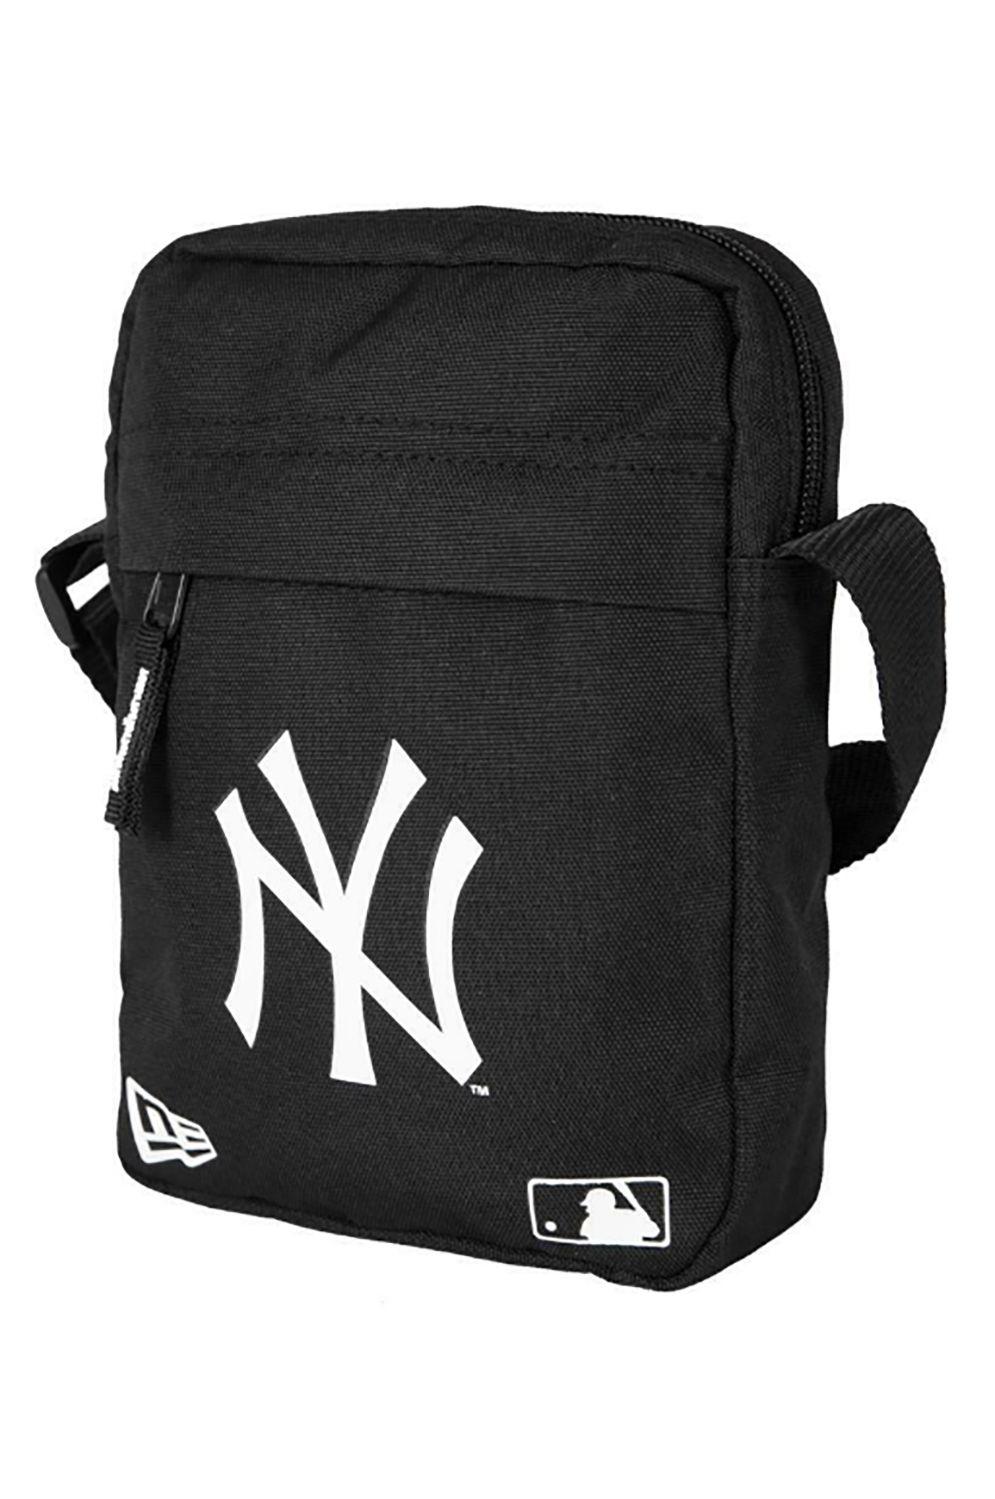 Bolsa New Era MLB SIDE BAG NEYYAN Black/White